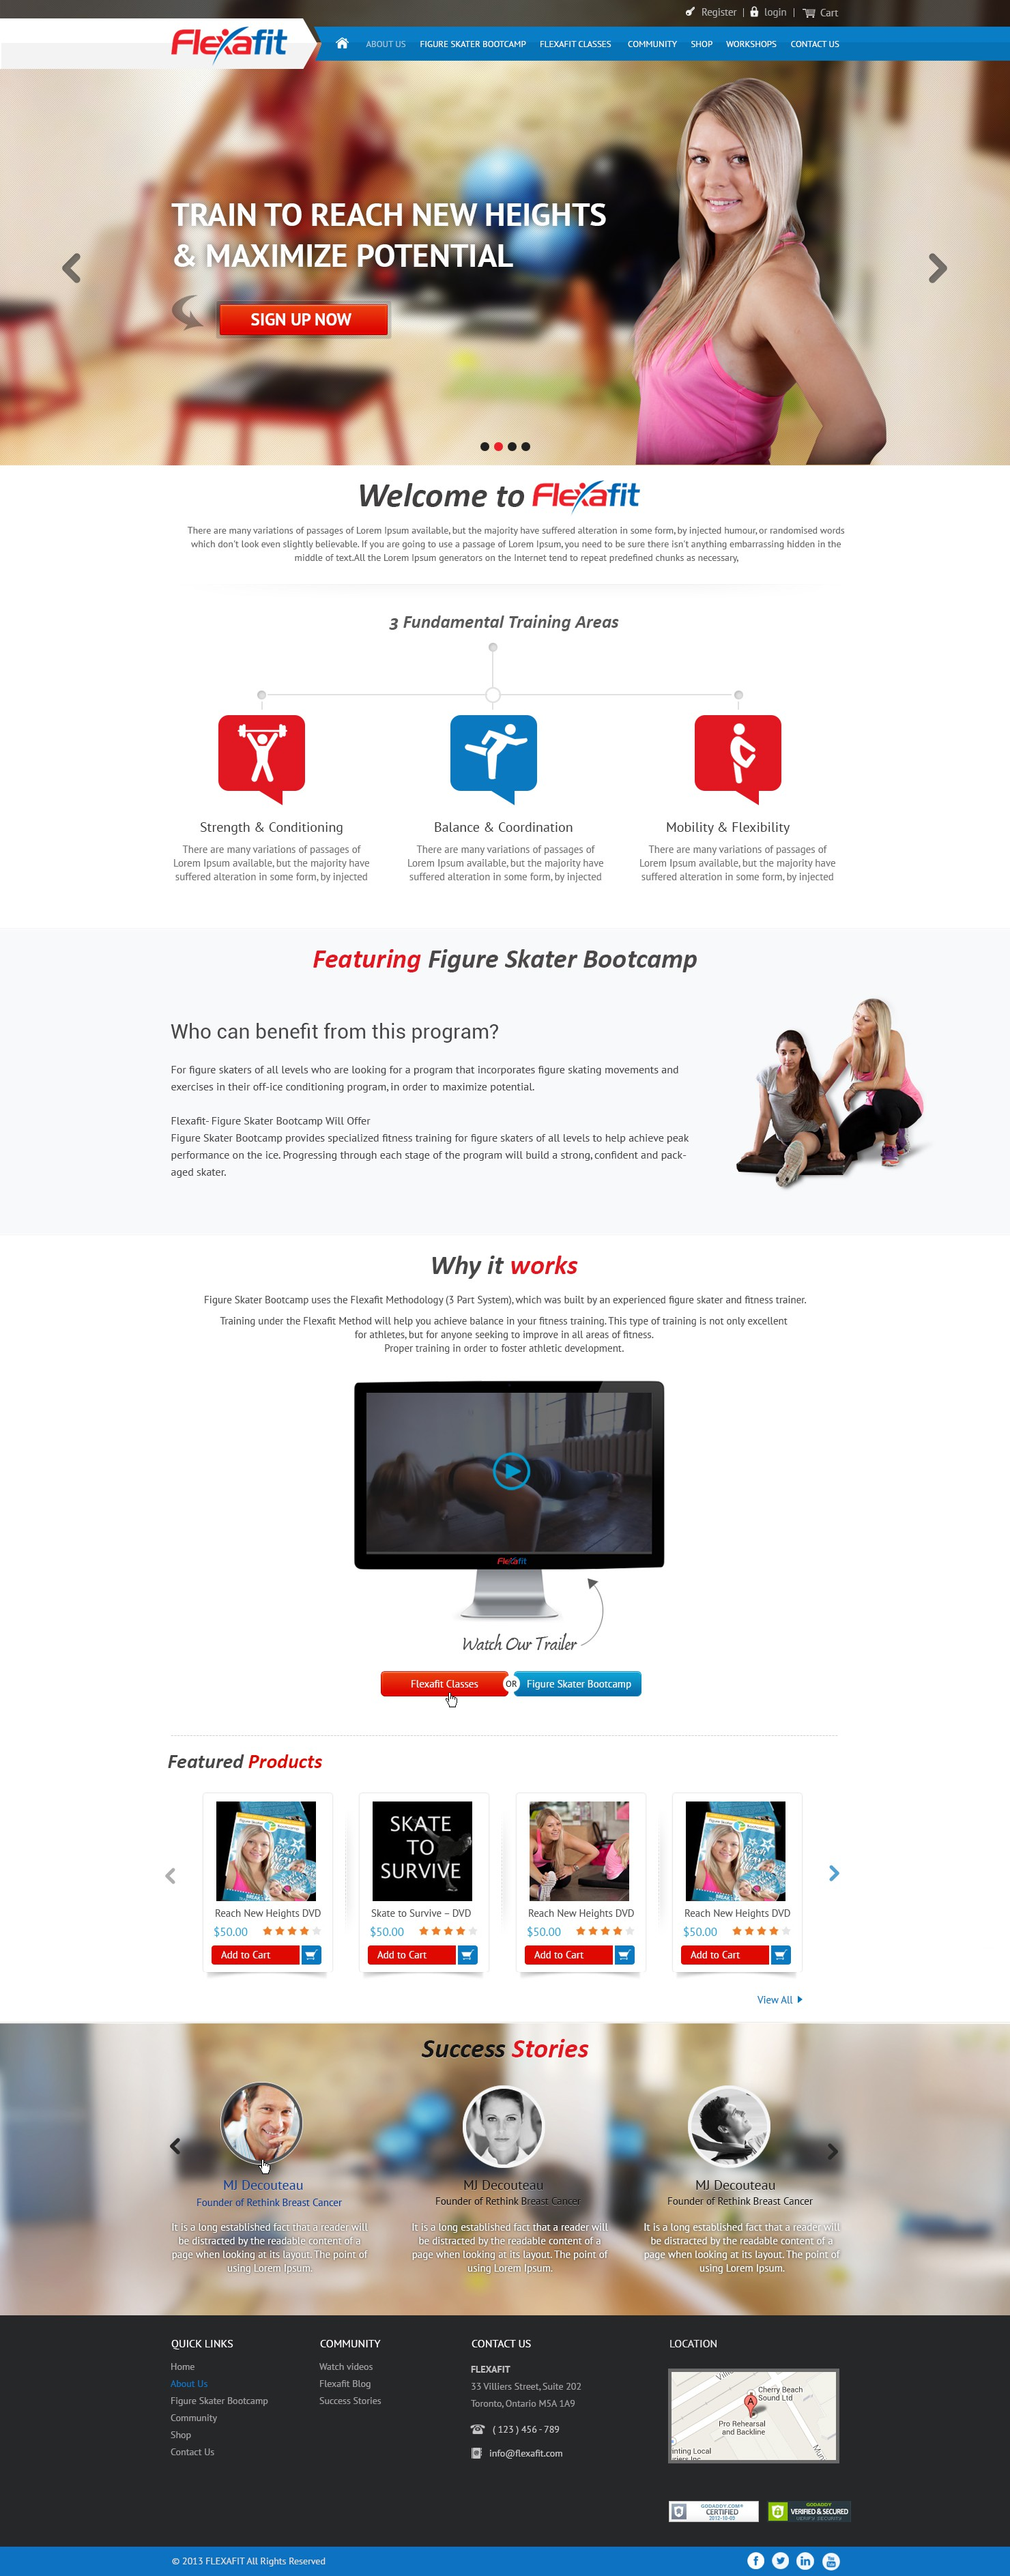 New website design wanted for Flexafit